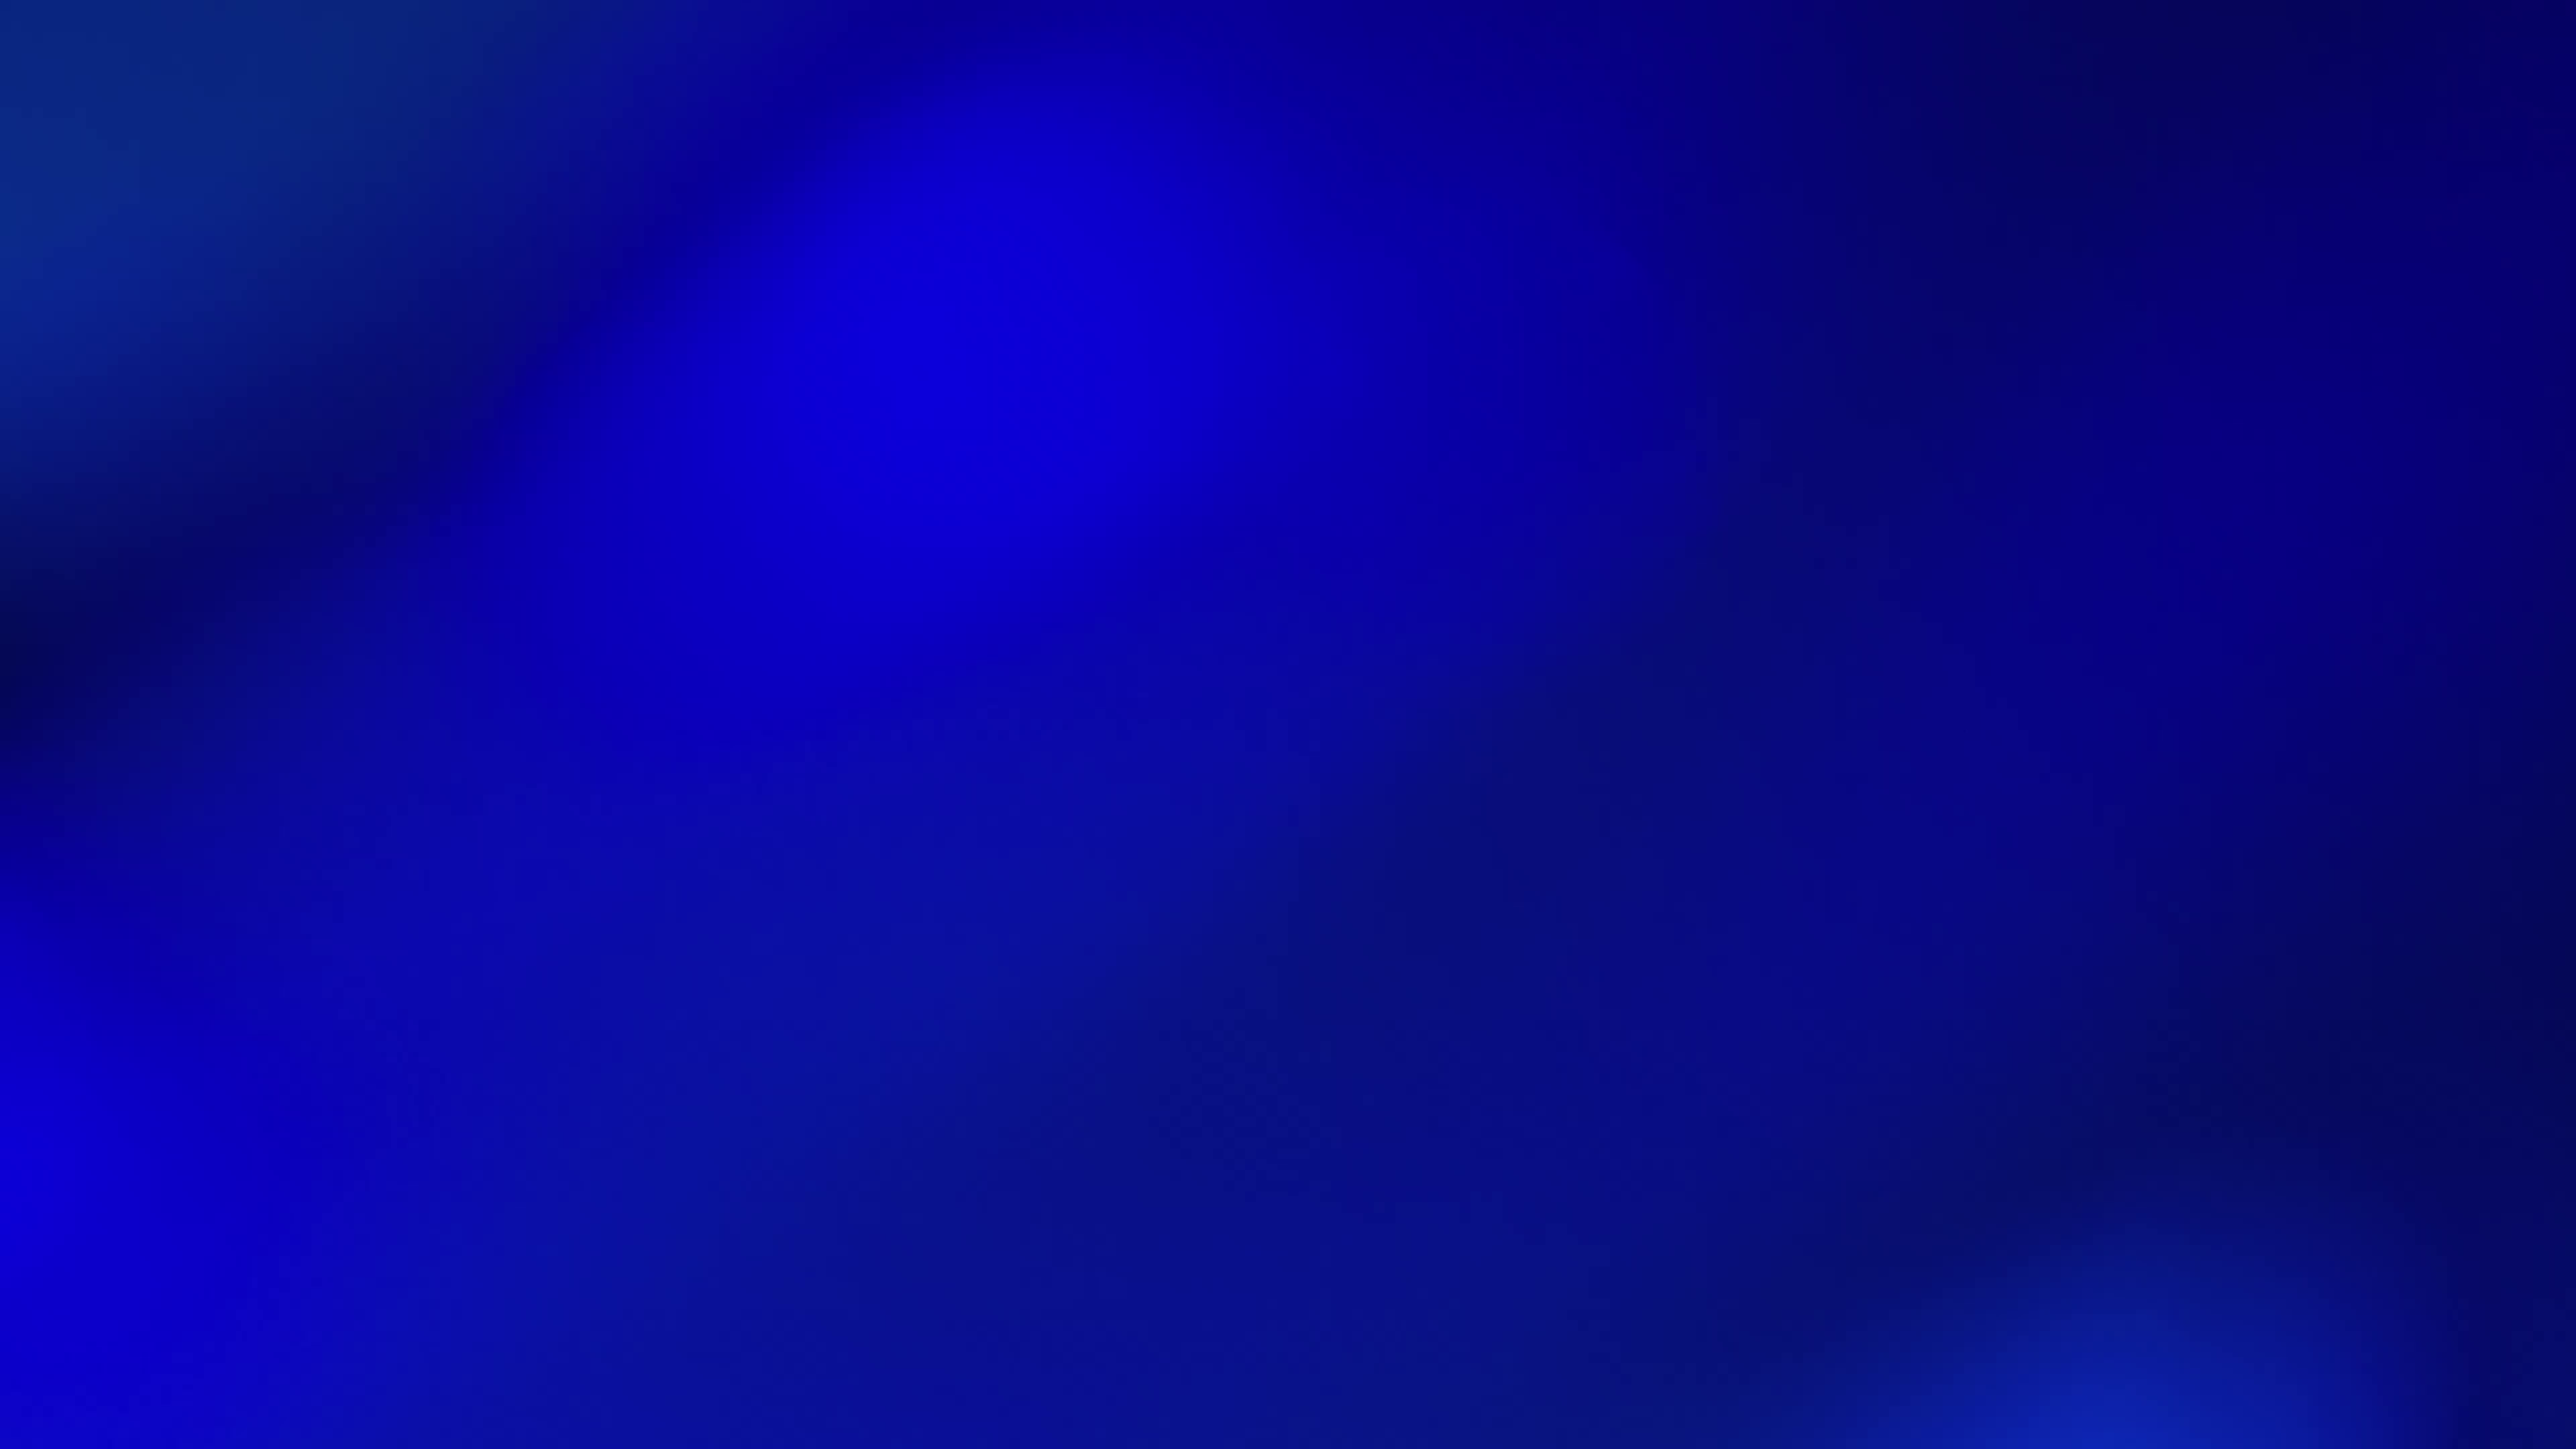 Elegant blue title background Stock Video Footage - Videoblocks